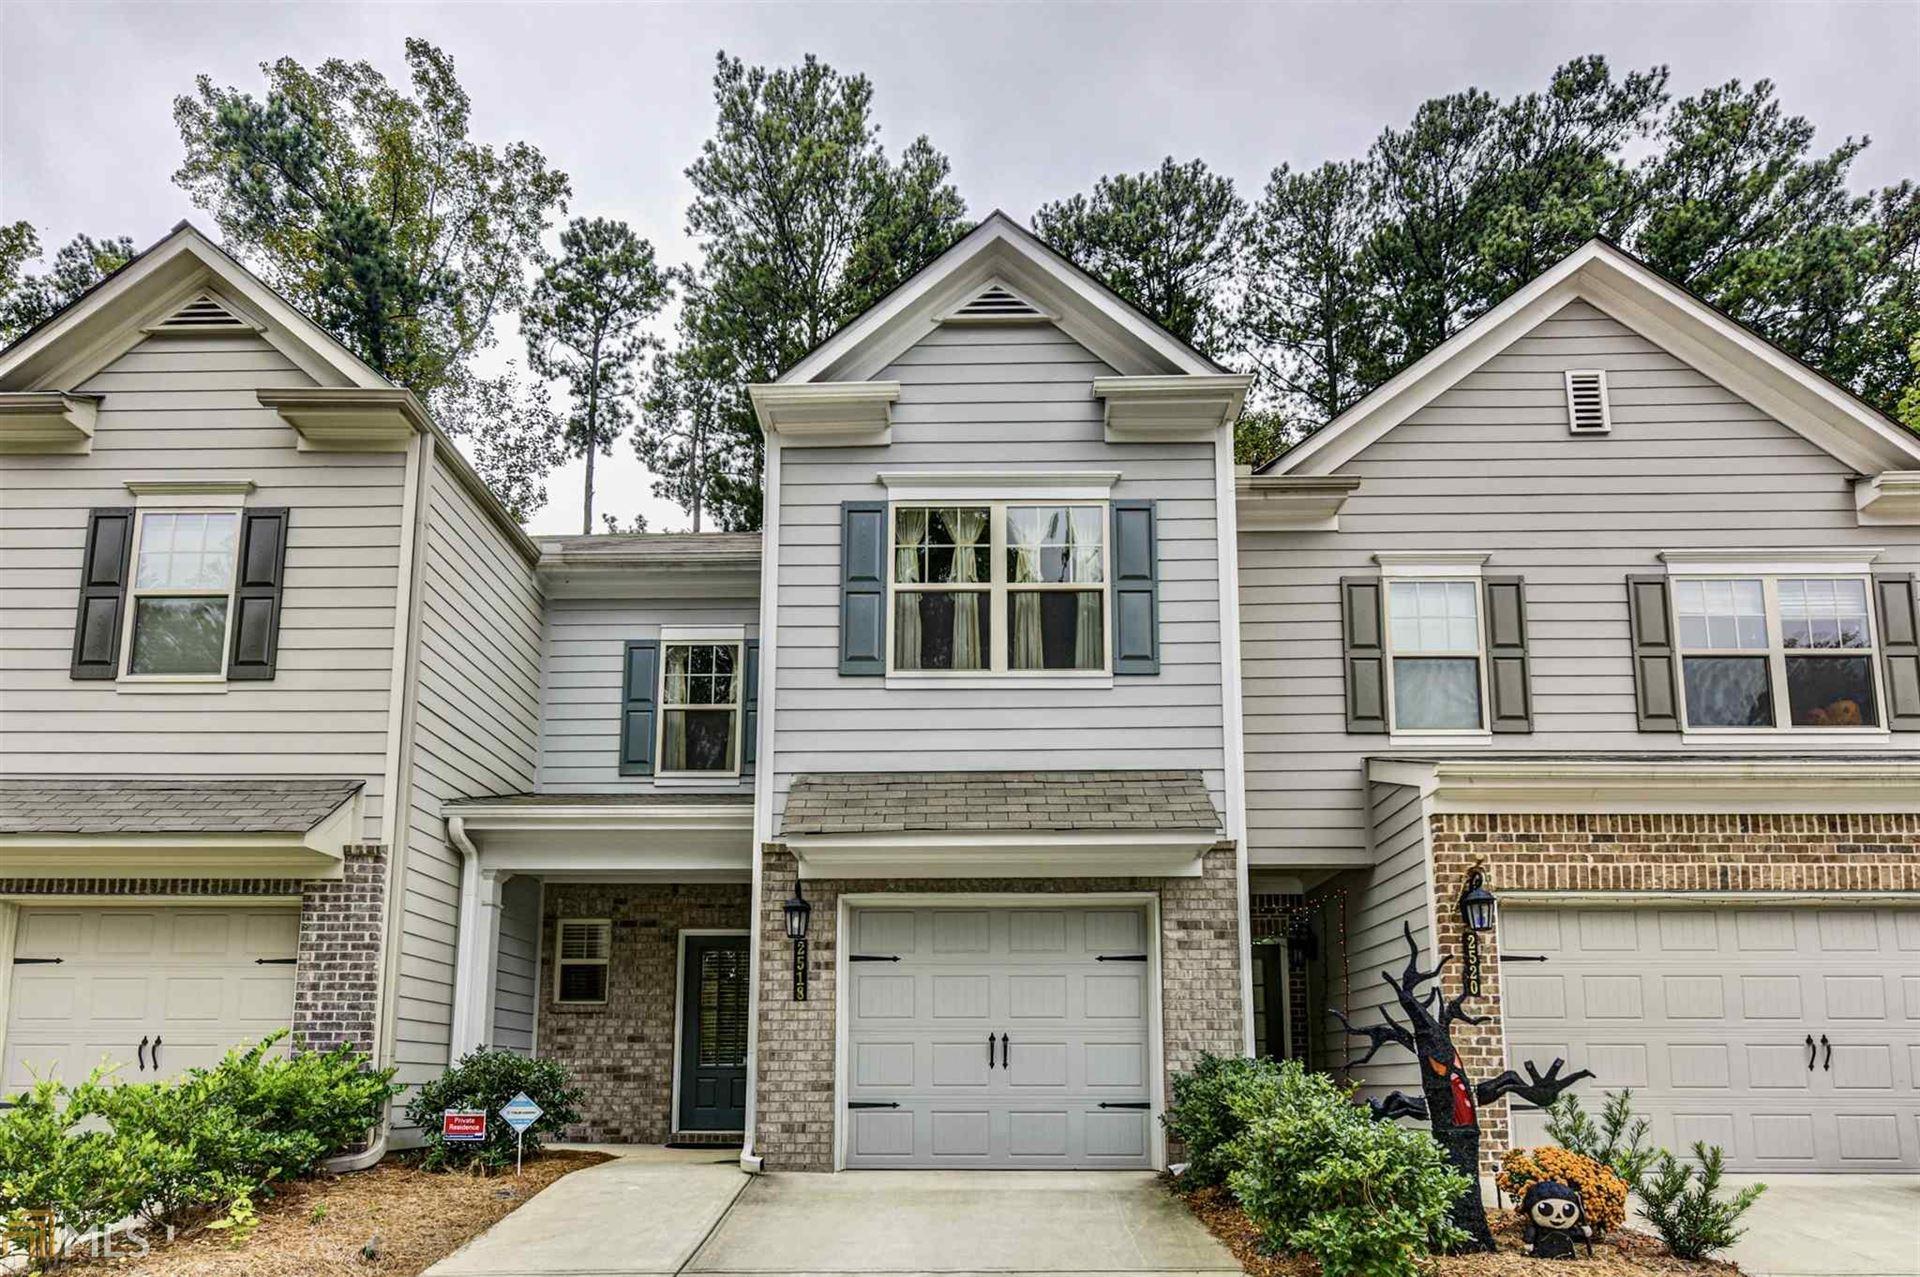 2518 Norwood Park Xing, Atlanta, GA 30340 - MLS#: 8874866